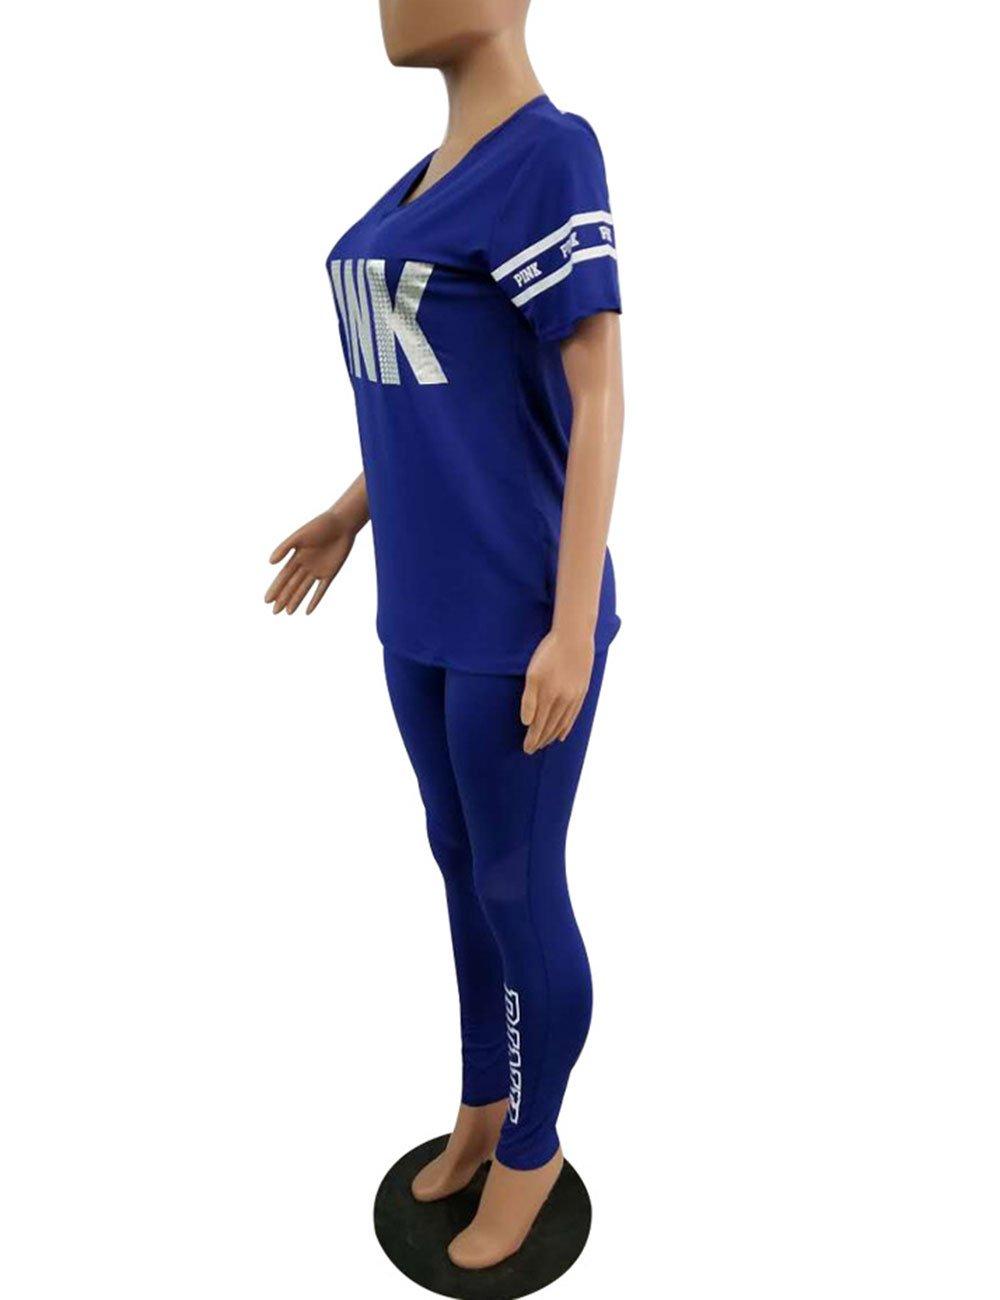 Ladies 2Pcs Tracksuit Casual T-Shirt Tops Gym Yoga Workout Mid Waist Running Pants 2 Piece Outfit Sport Wear Suit Sweatpants HOMEBABY Women Sports Velvet Sweatshirt Sets